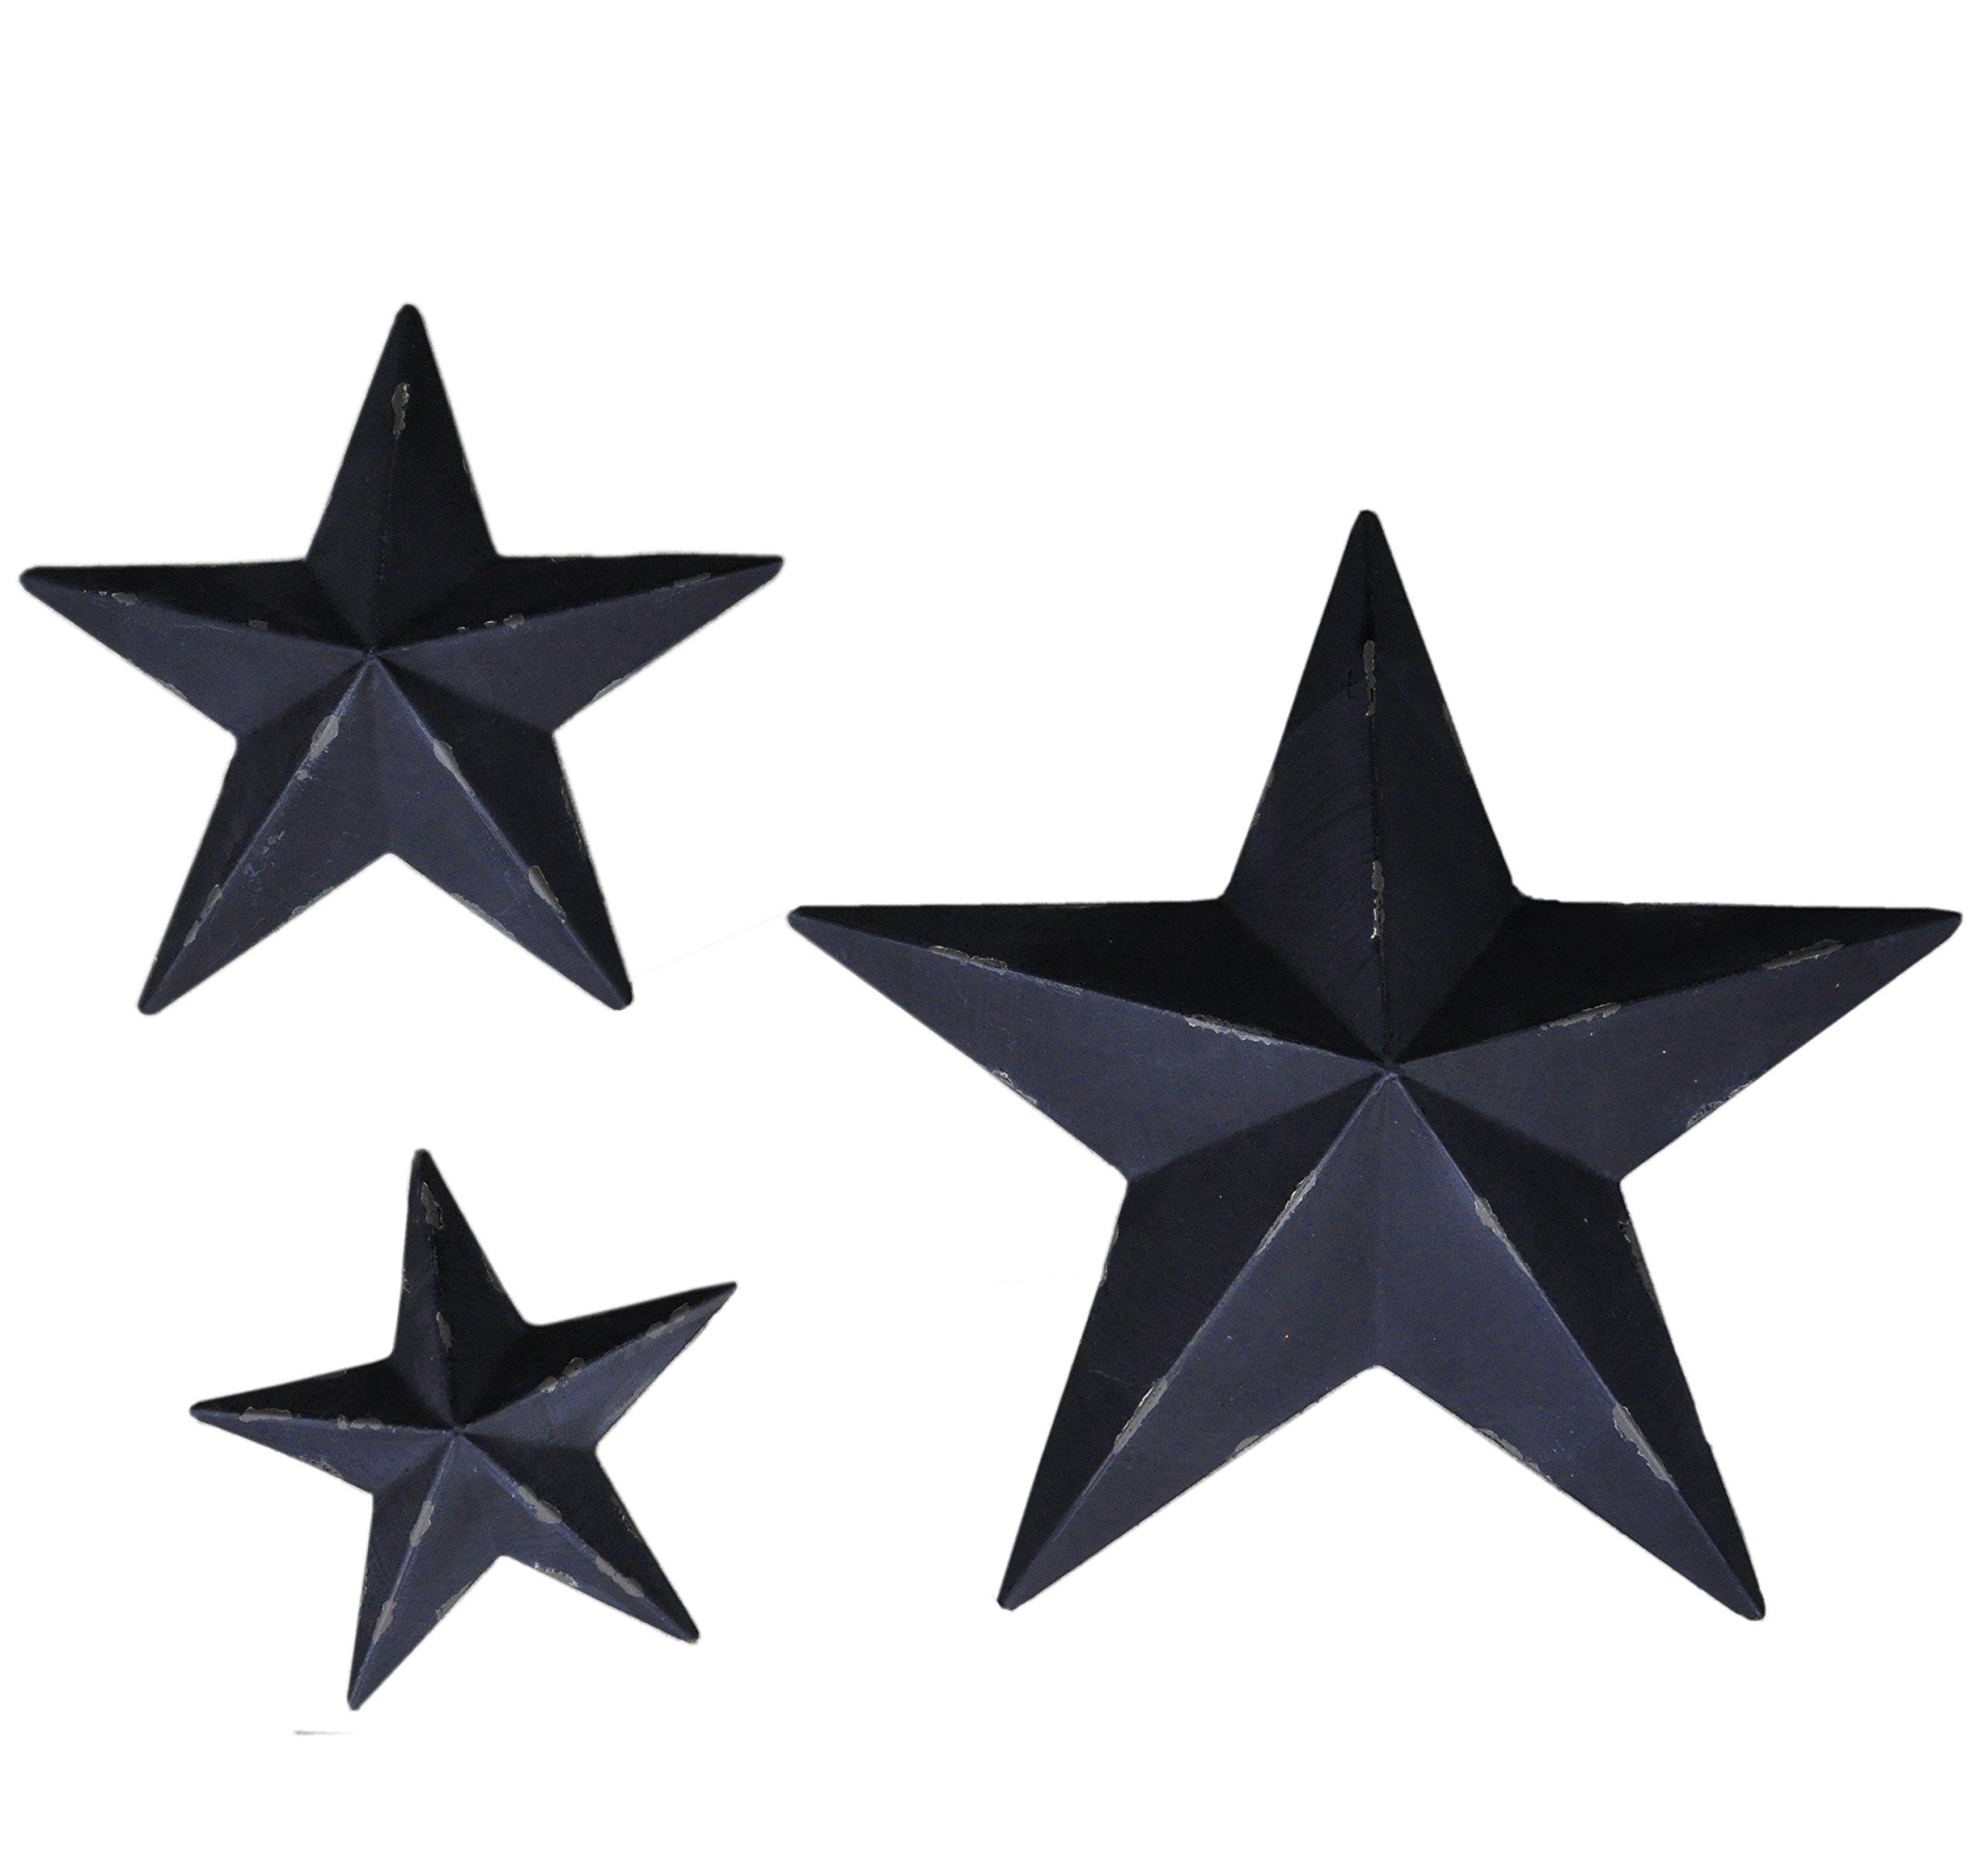 YL Crafts - Metal Stars Wall Decoration Mounted Wall Art 3pcs/set (Black) by Yun&Lin Crafts